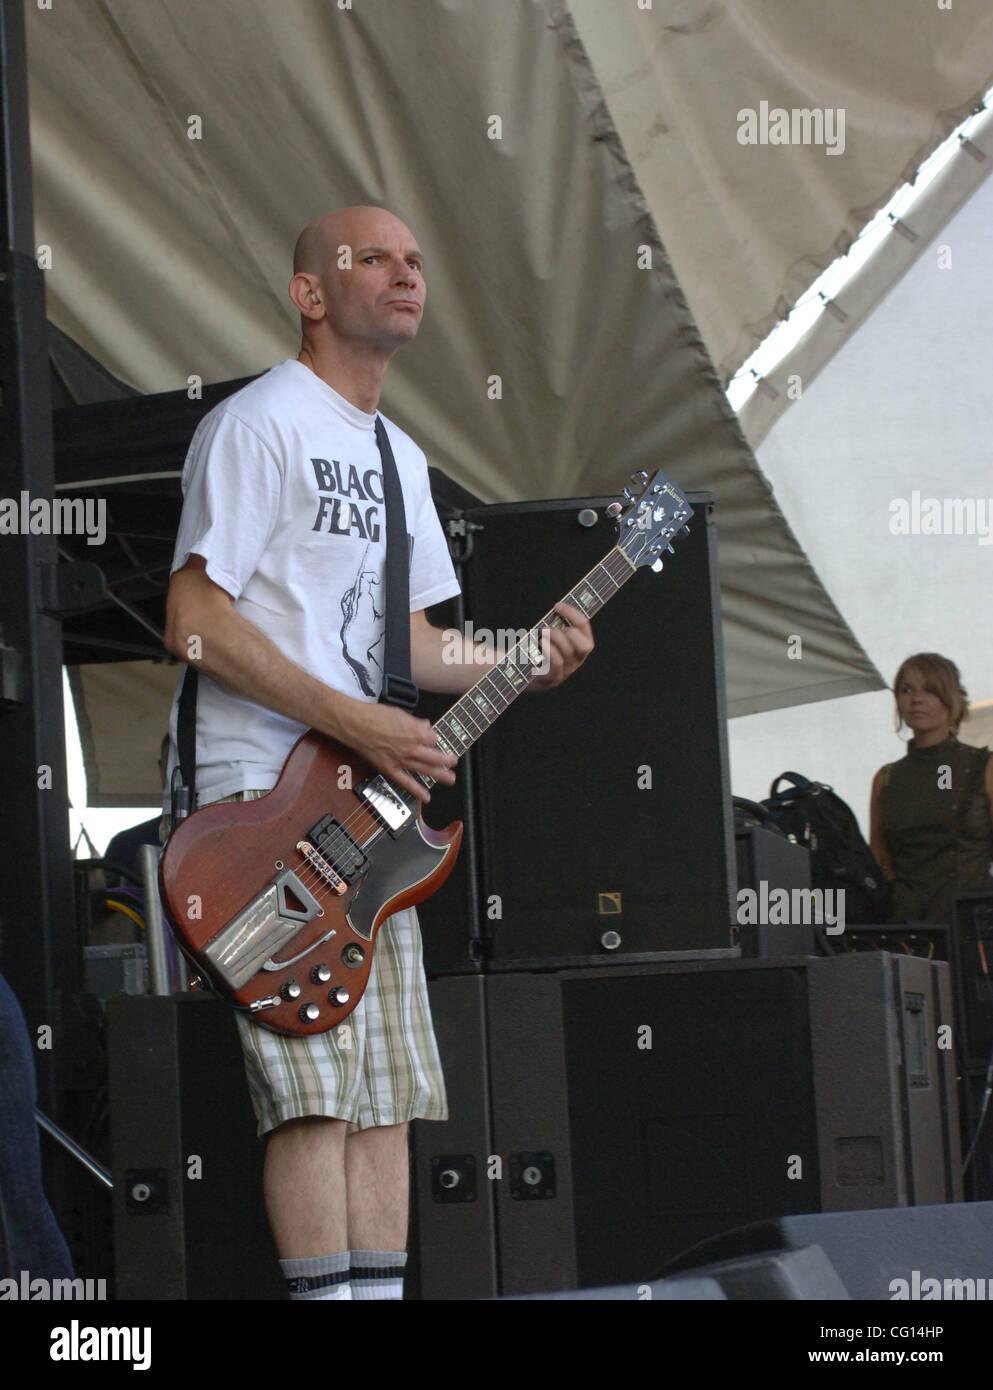 Jul 24, 2007 - Virginia Beach, VA, USA - The Vans Warped Tour on its 13th year brings BAD RELIGION to the Verizon - Stock Image